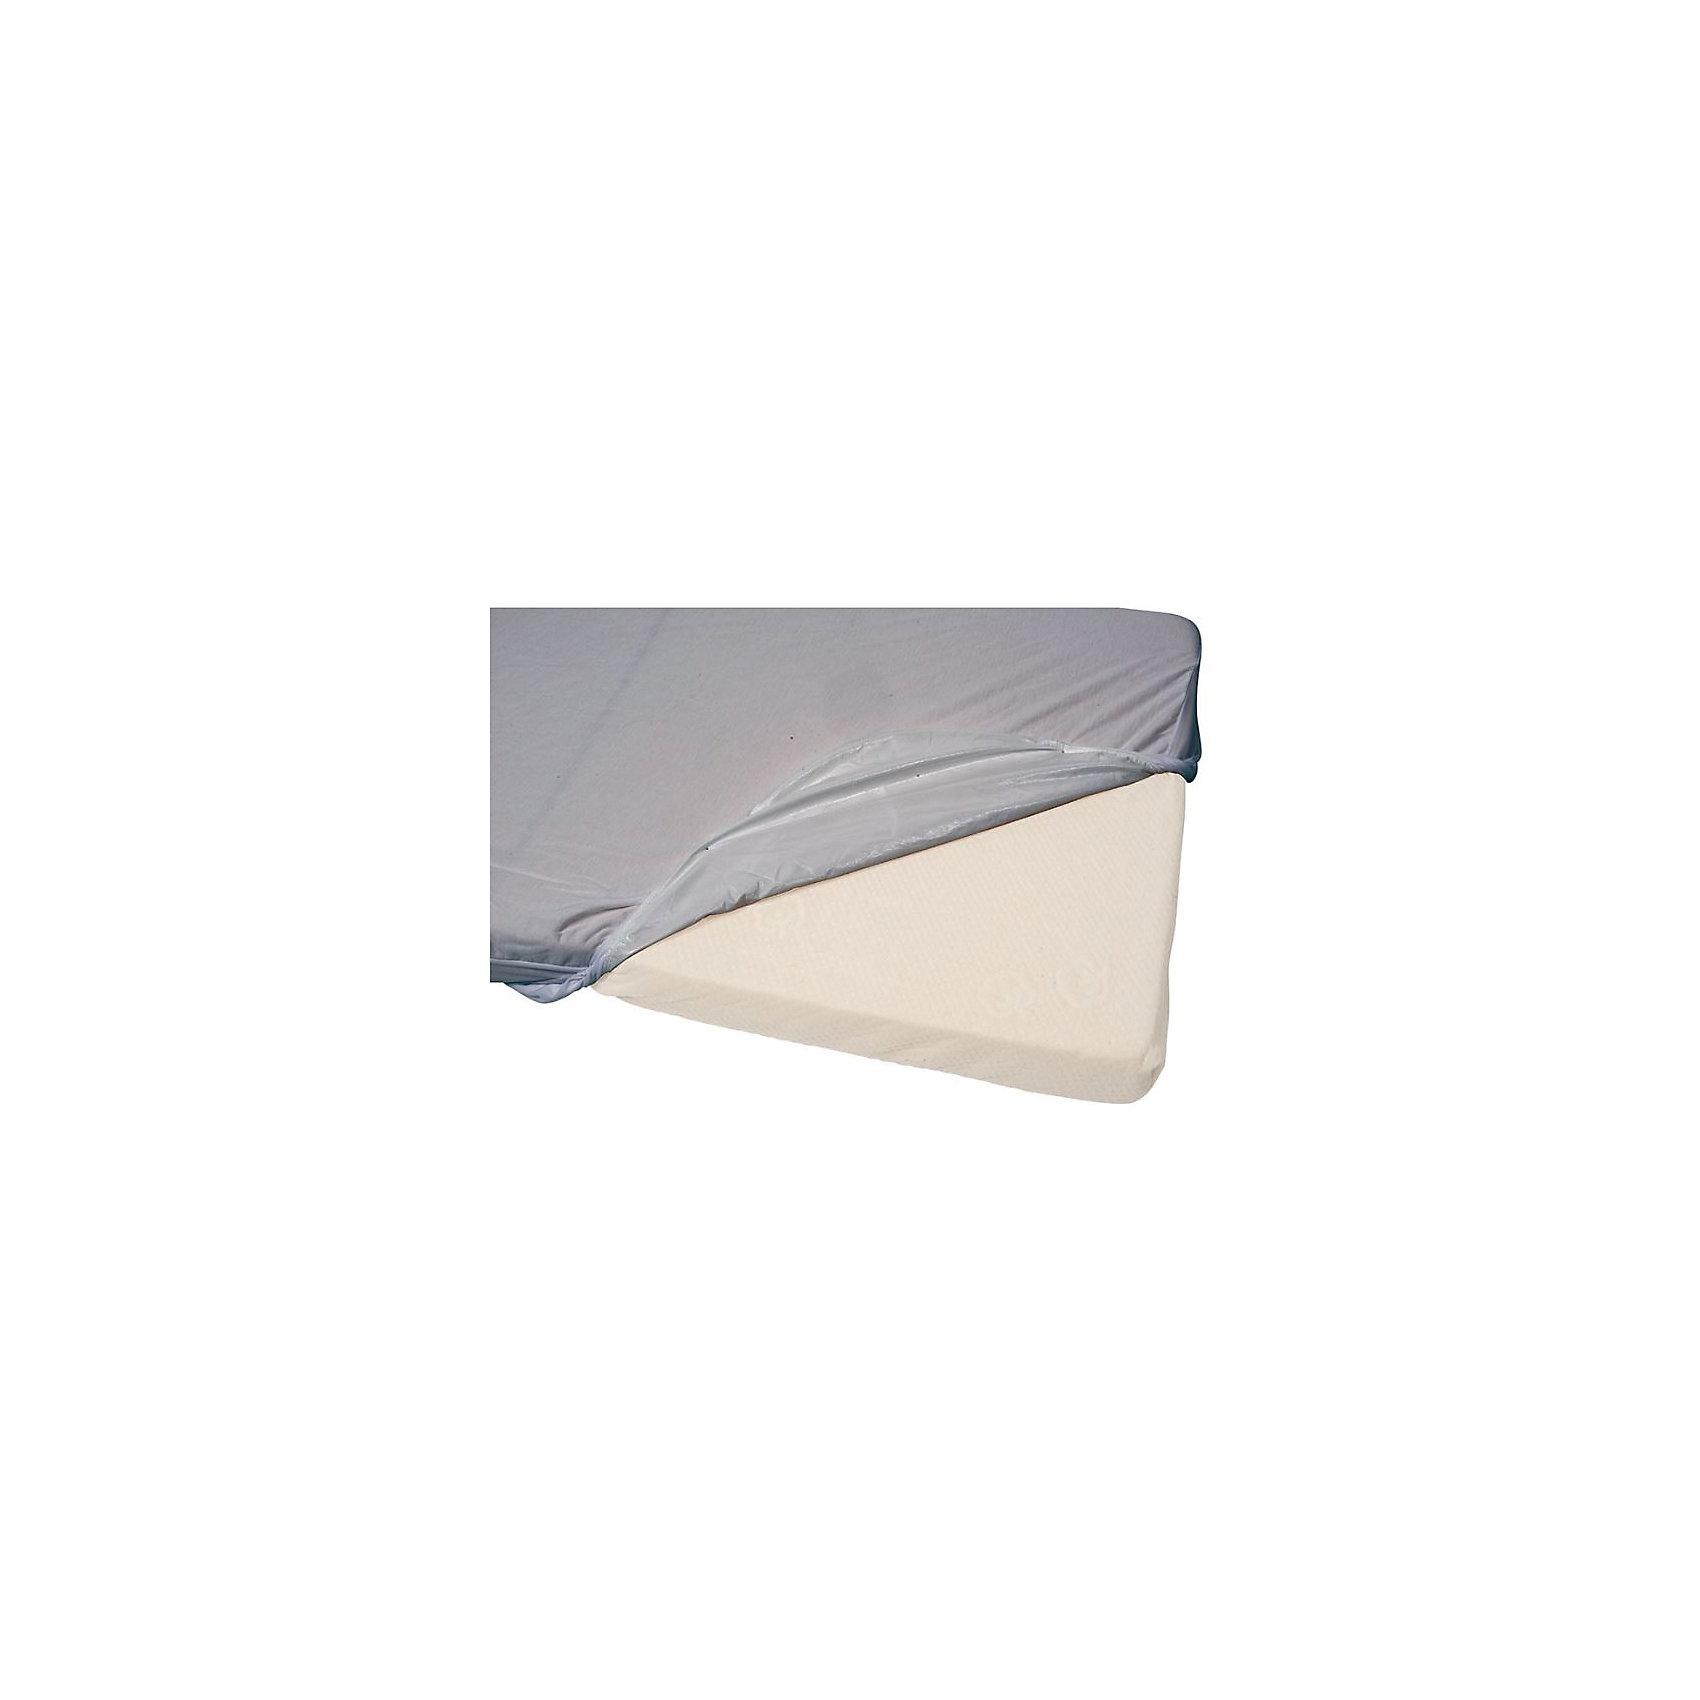 candide Наматрасник водонепроницаемый 60х120 см., хлопок, Candide, Серый простыни candide простыня cotton fitted sheet 60x120